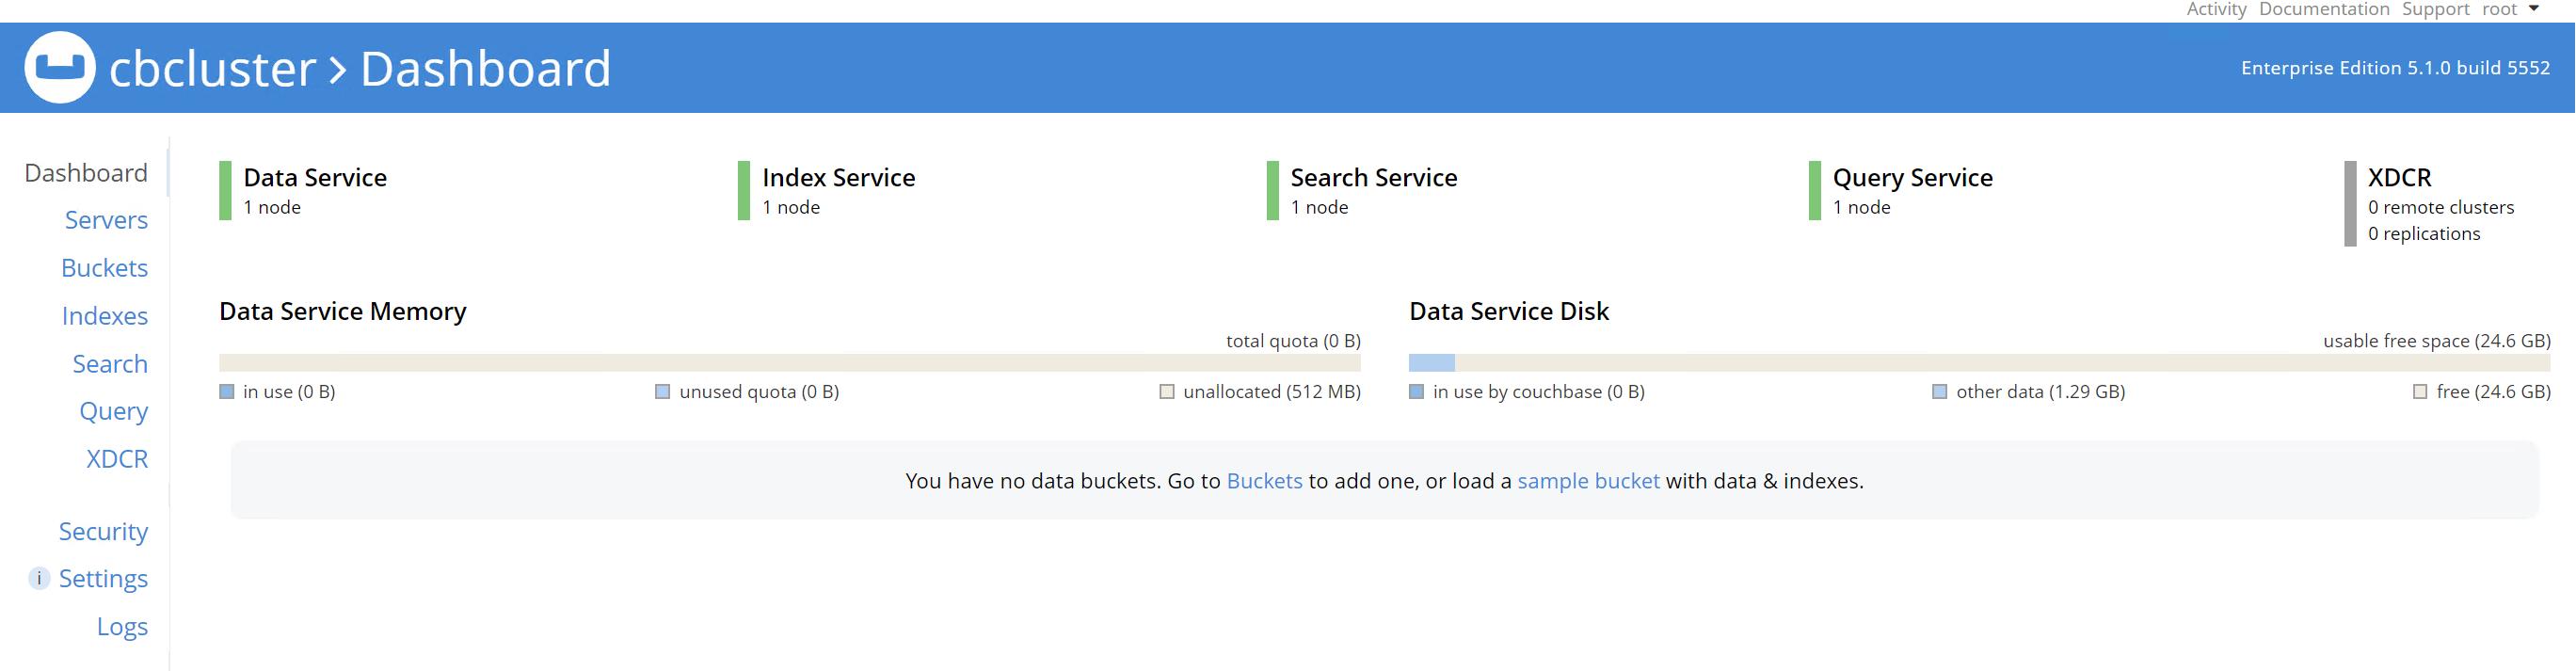 【DB宝46】NoSQL数据库之CouchBase简介、集群搭建、XDCR同步及备份恢复